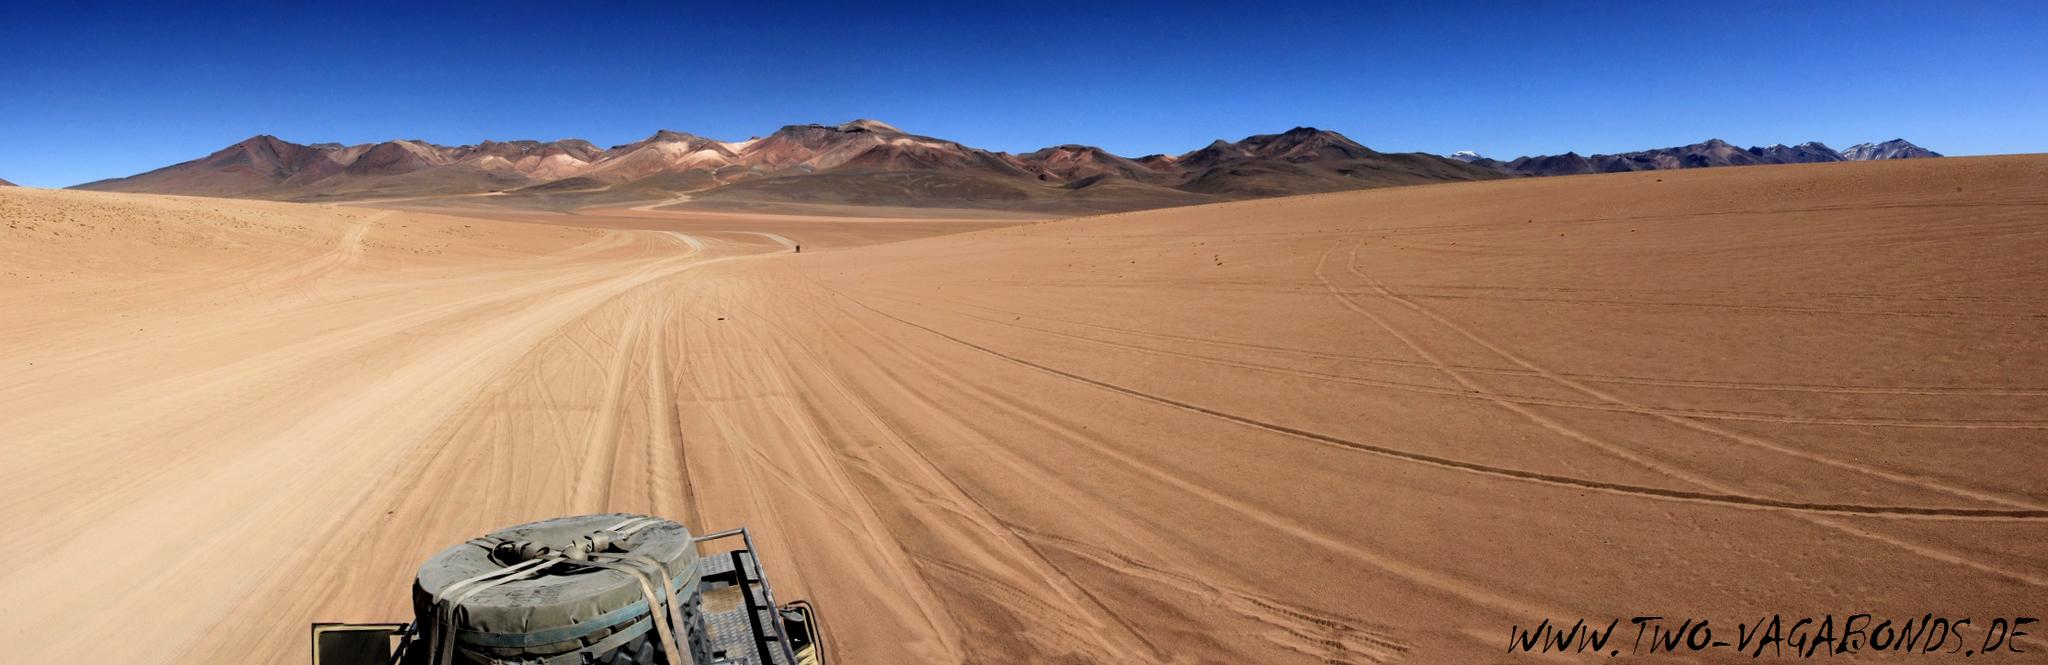 BOLIVIEN 2015 - LAGUNENROUTE